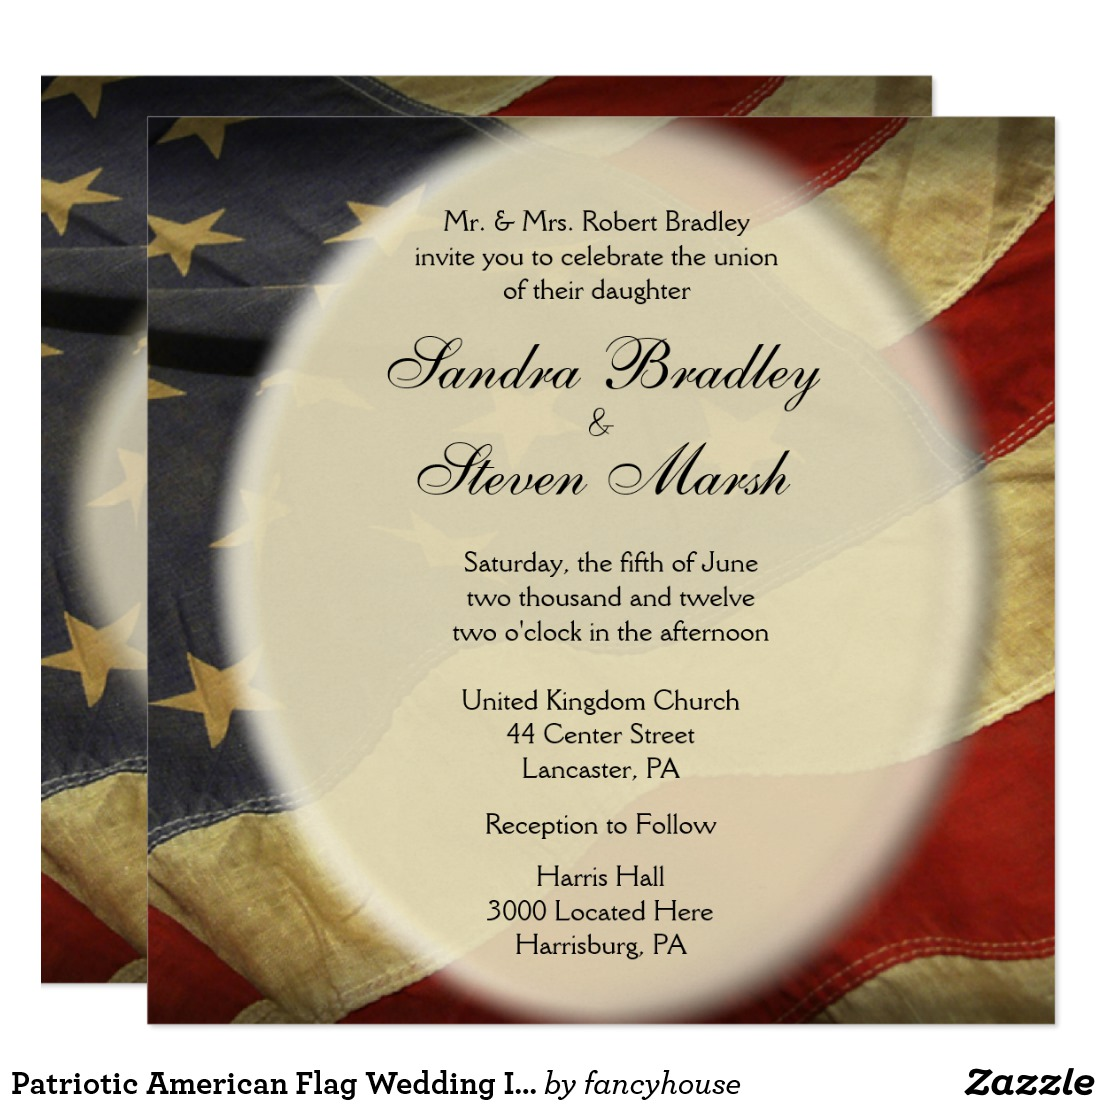 Patriotic American Flag Wedding Invitation